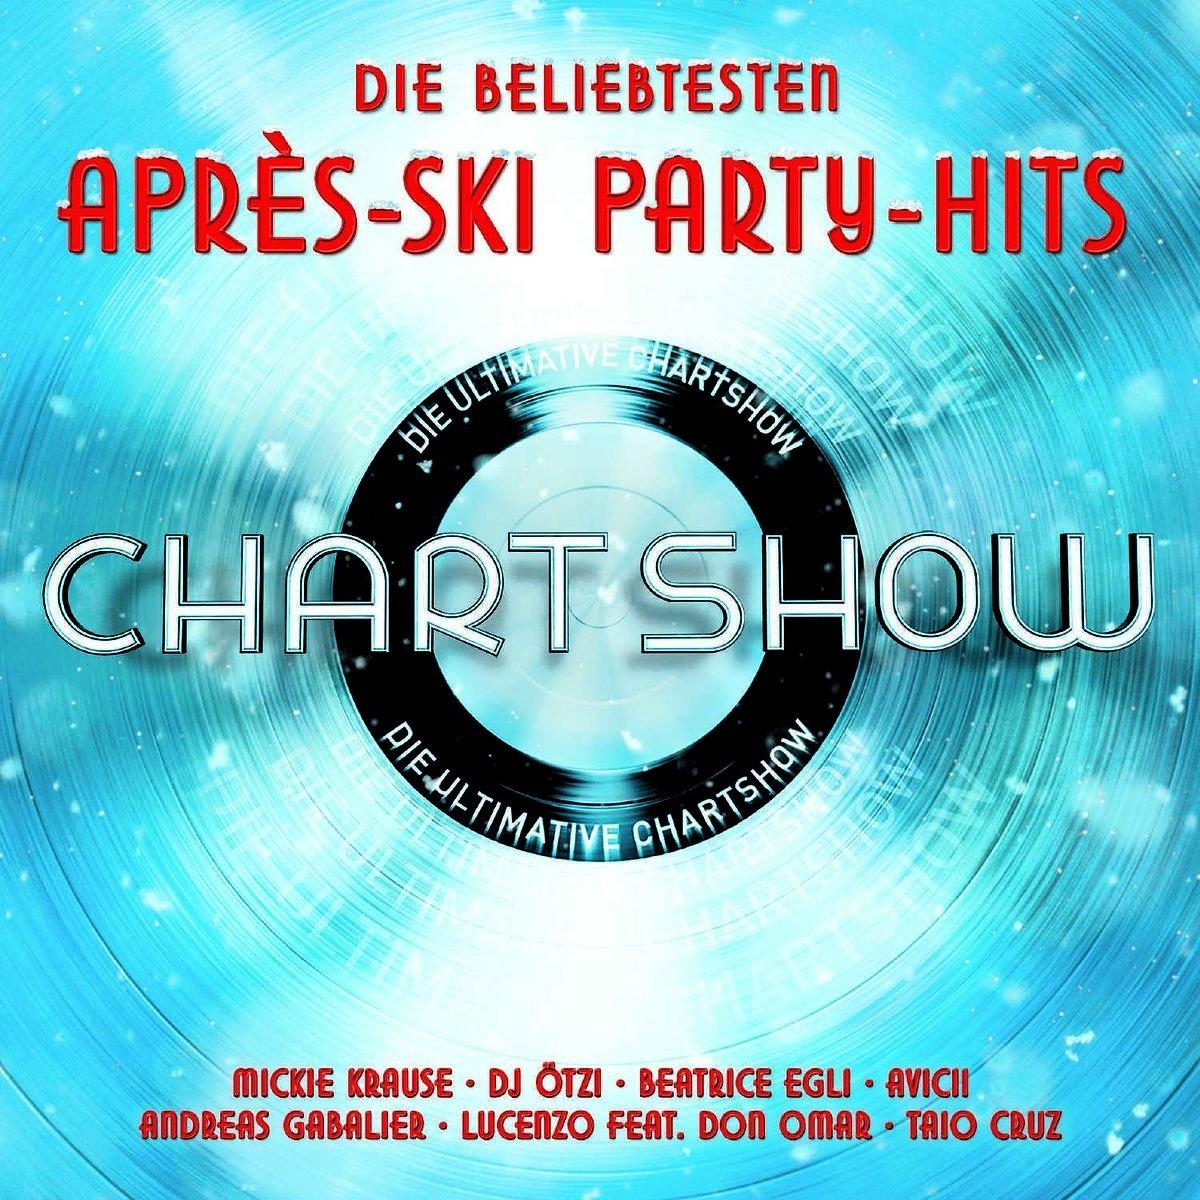 Die beliebtesten Après-Ski-Party-Hits ultimative chartshow